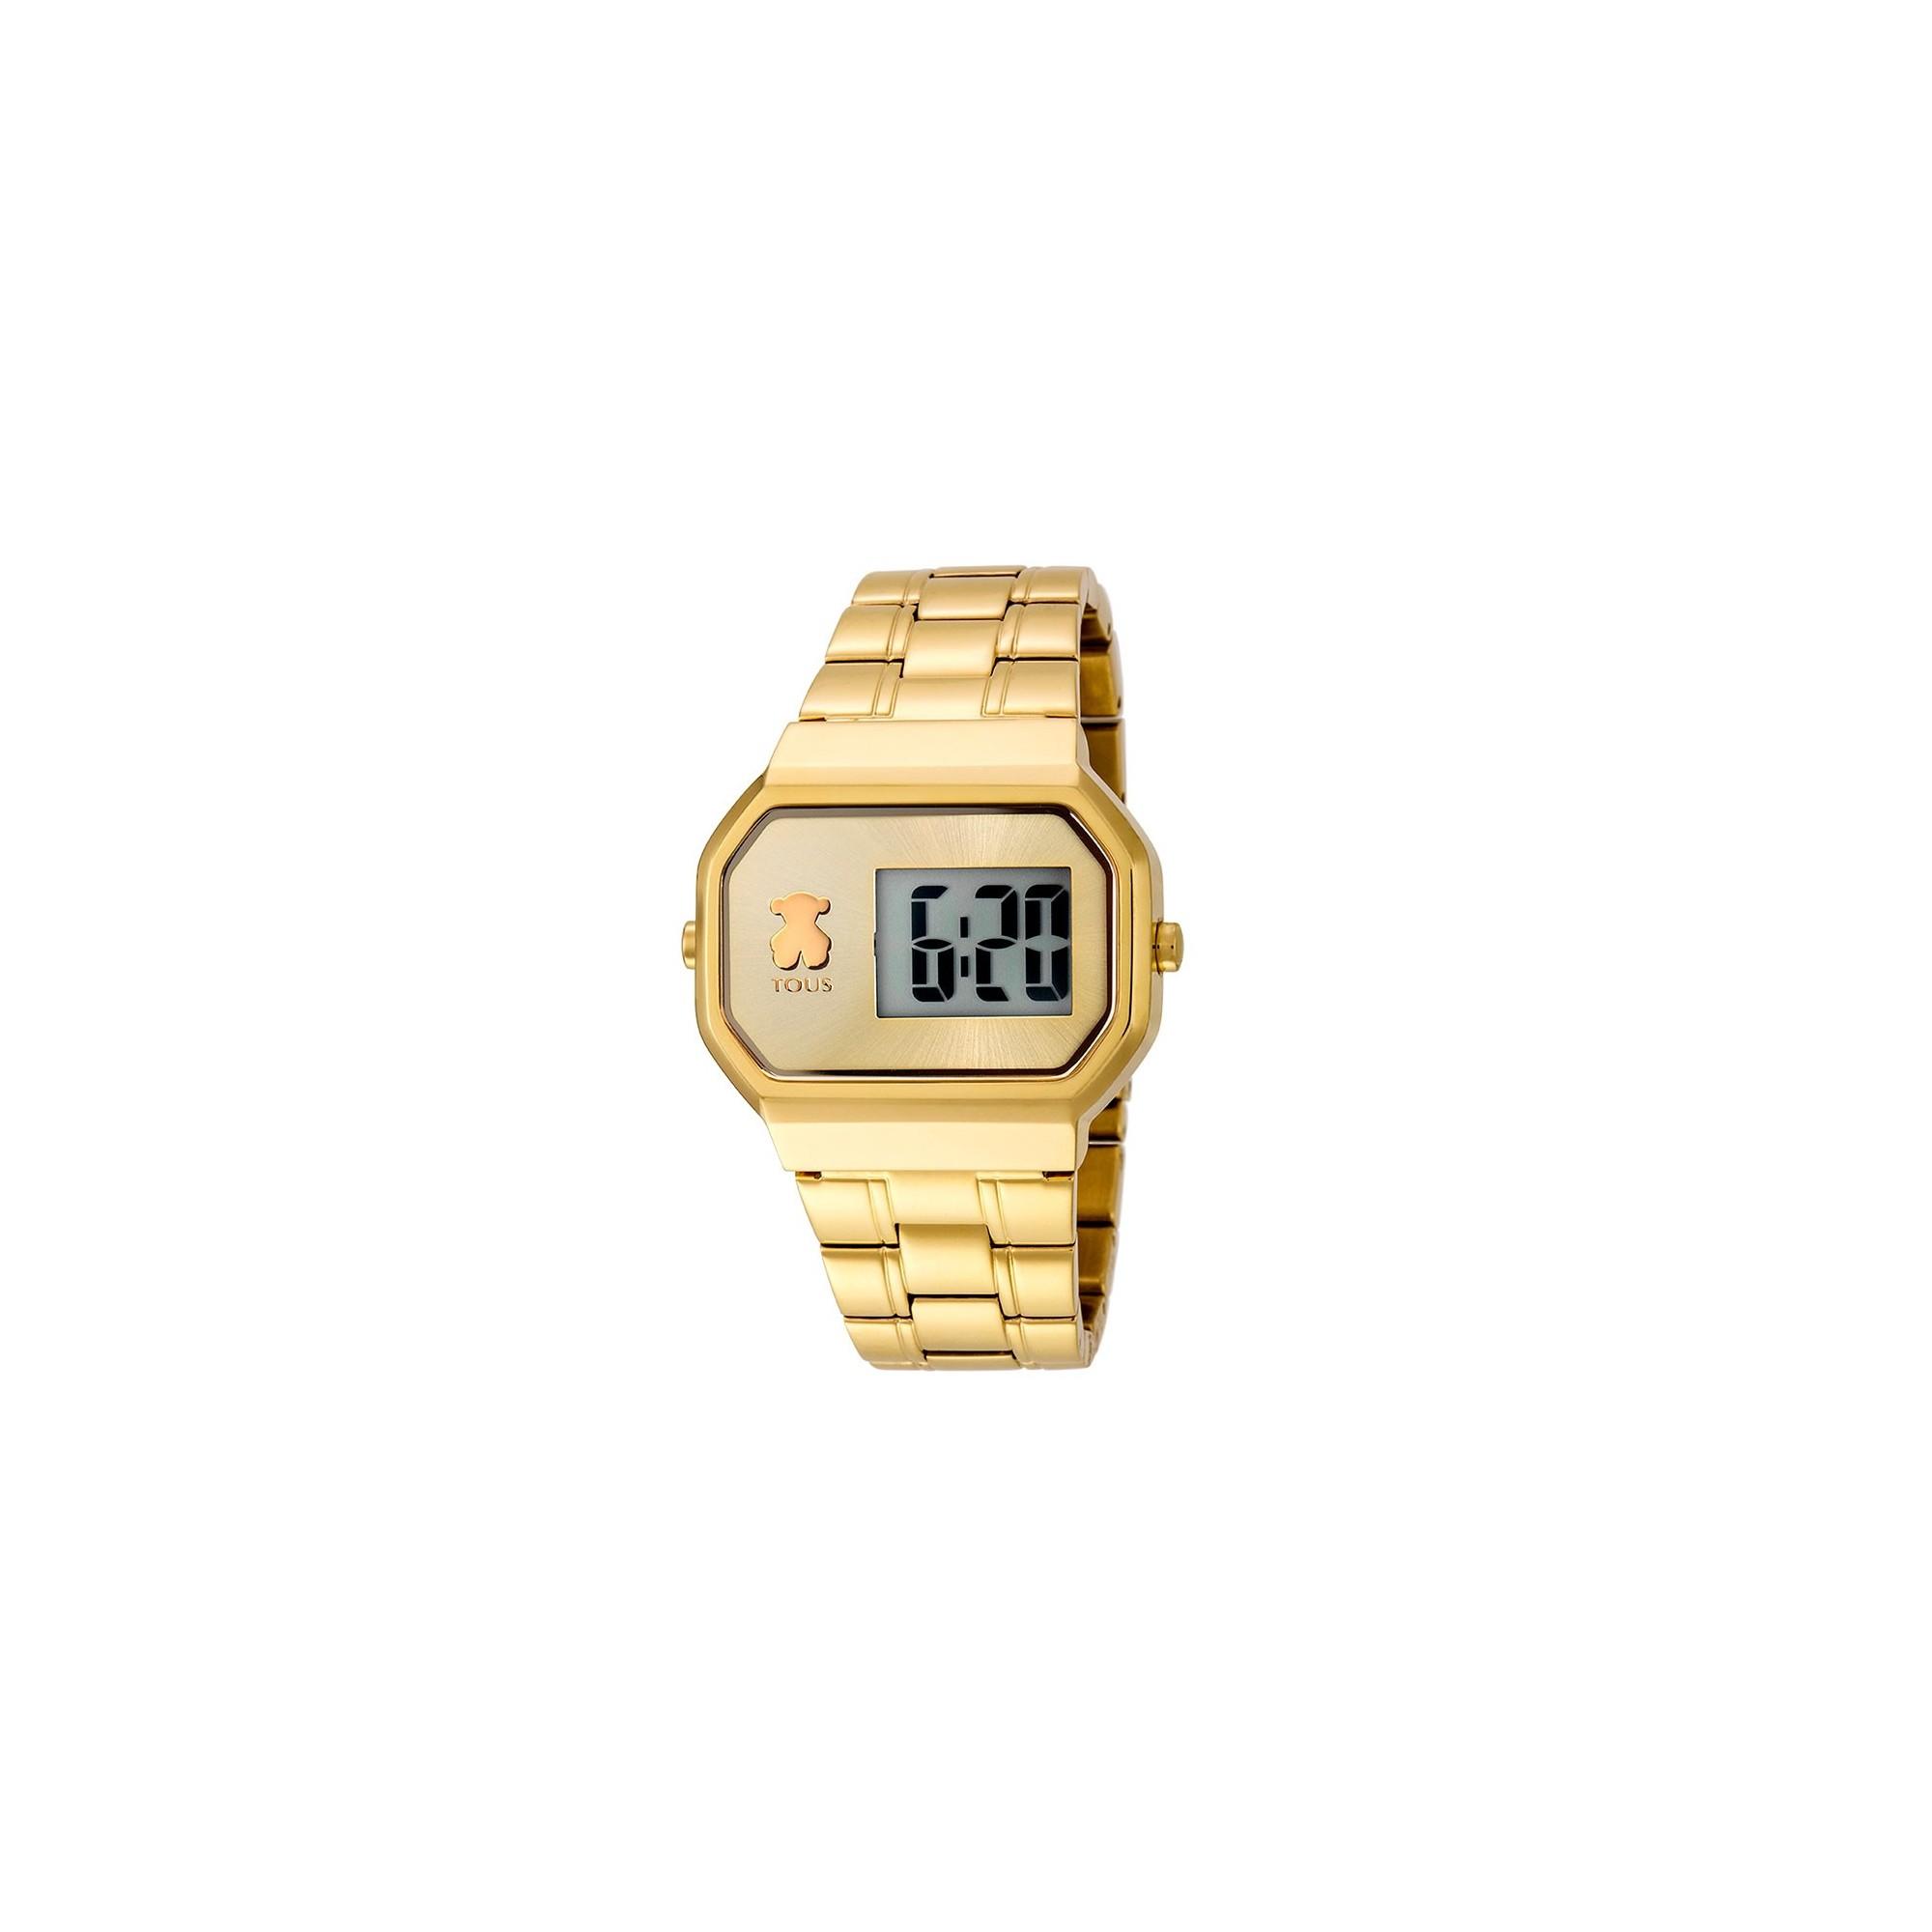 a94d077a6601 Reloj Tous Chica D-Bear Digital Dorado Brazalete 600350300